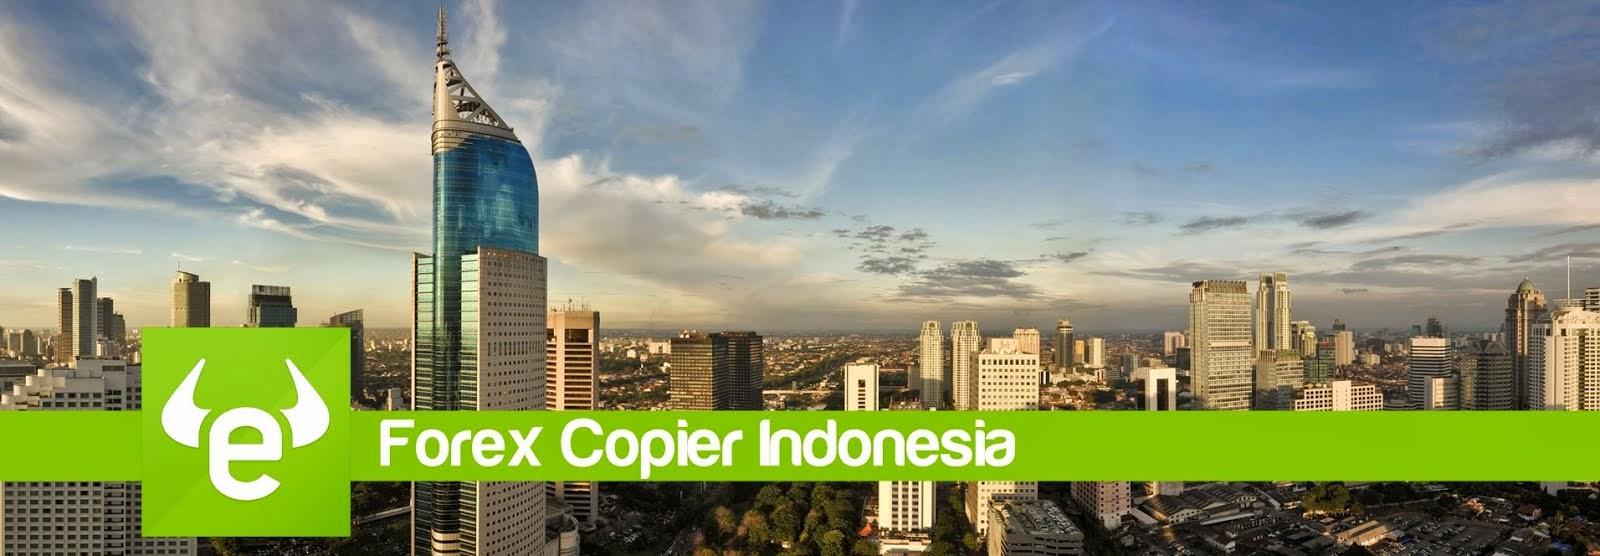 eToro Indonesia | Komunitas Forex Trading Forex Copier Indonesia